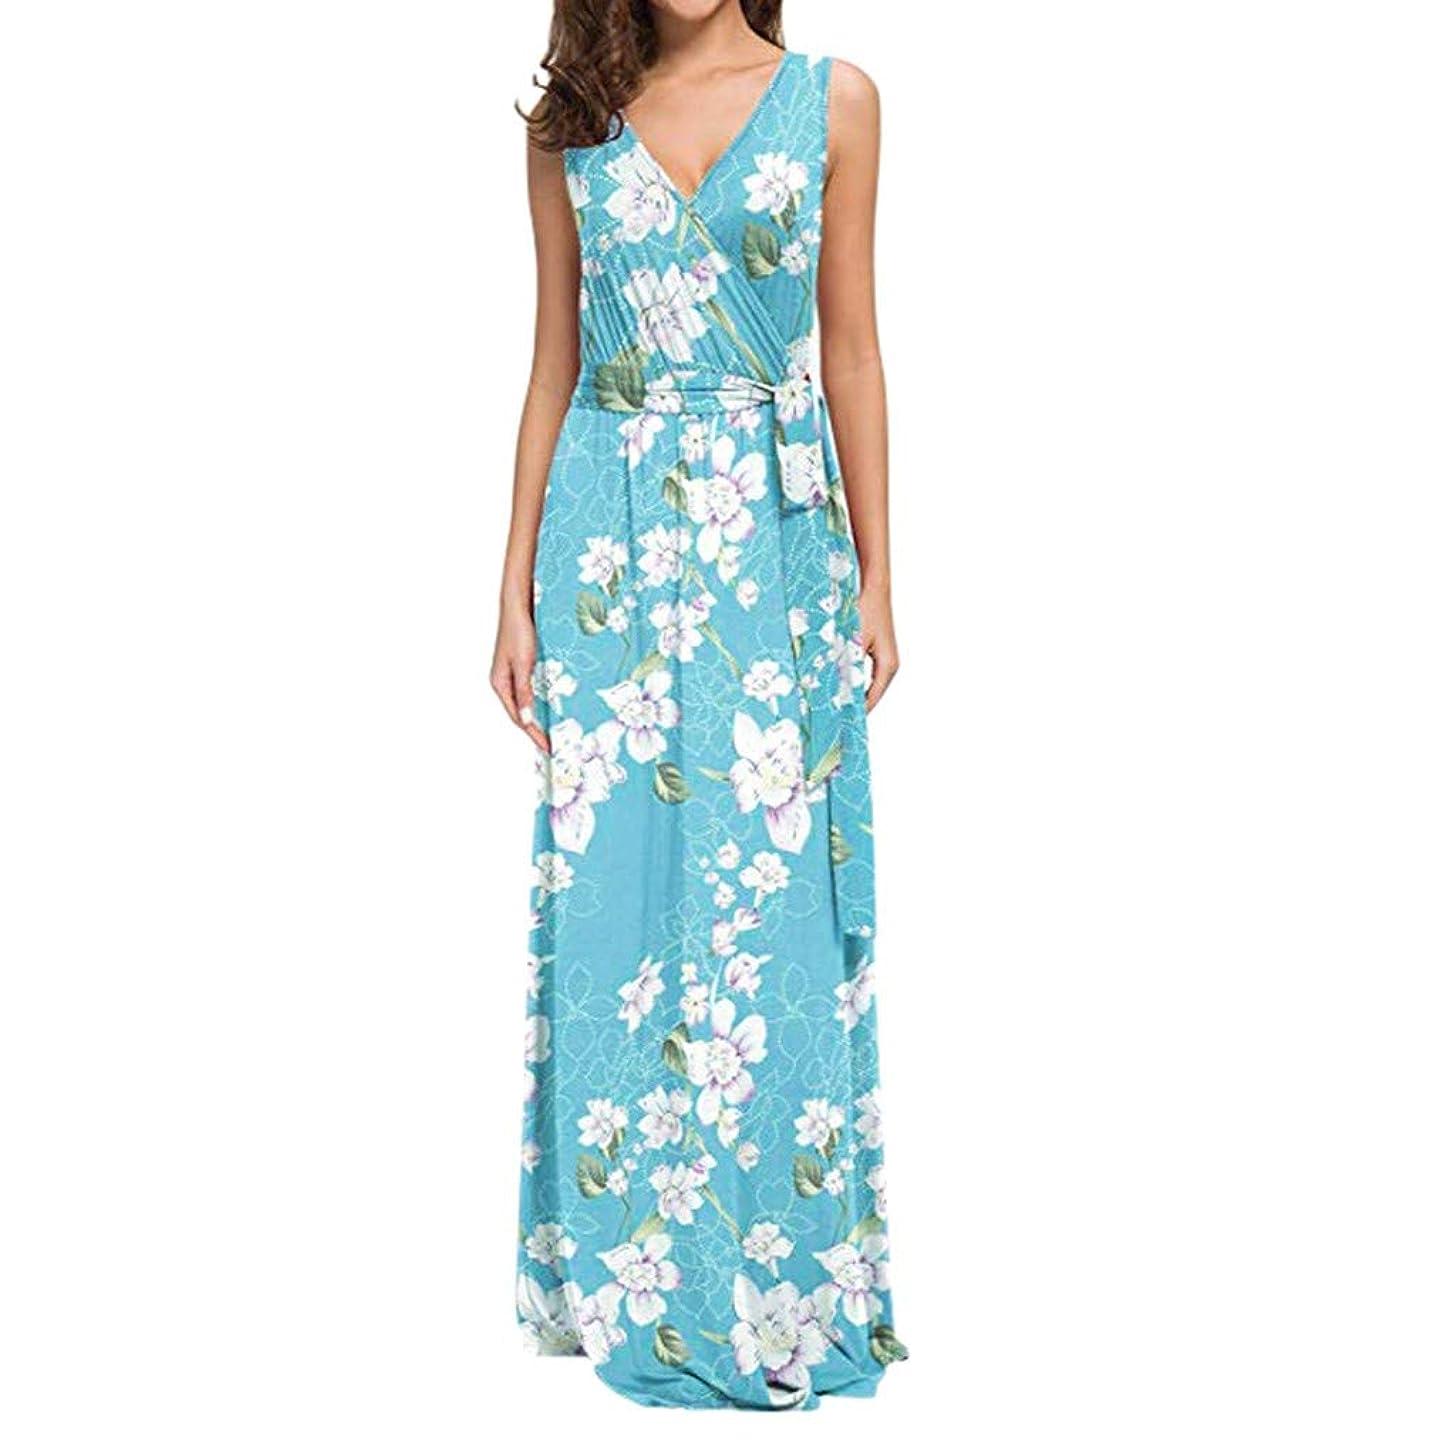 Women'S Sleeveless Summer Floral Printed with Belt Maxi Casual Dress Hotkey Womens Summer Casual Sleeveless